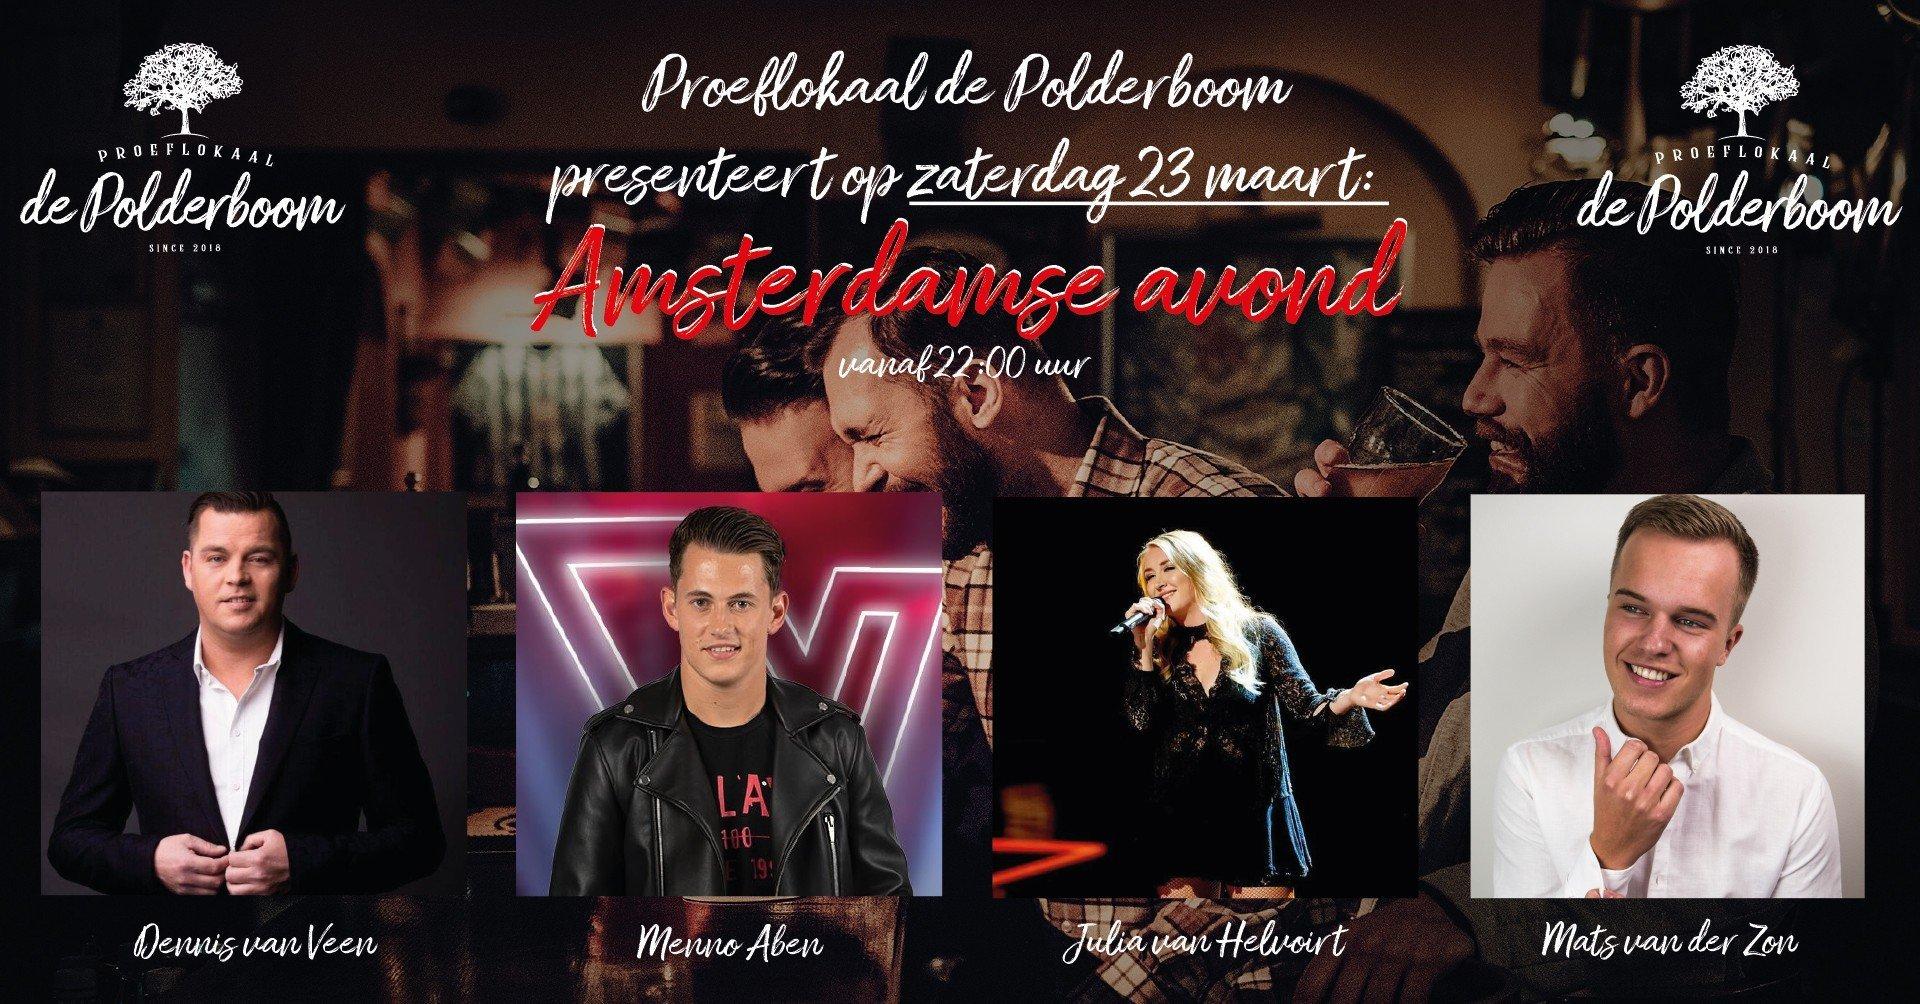 23-03-2019 Amsterdamse Avond